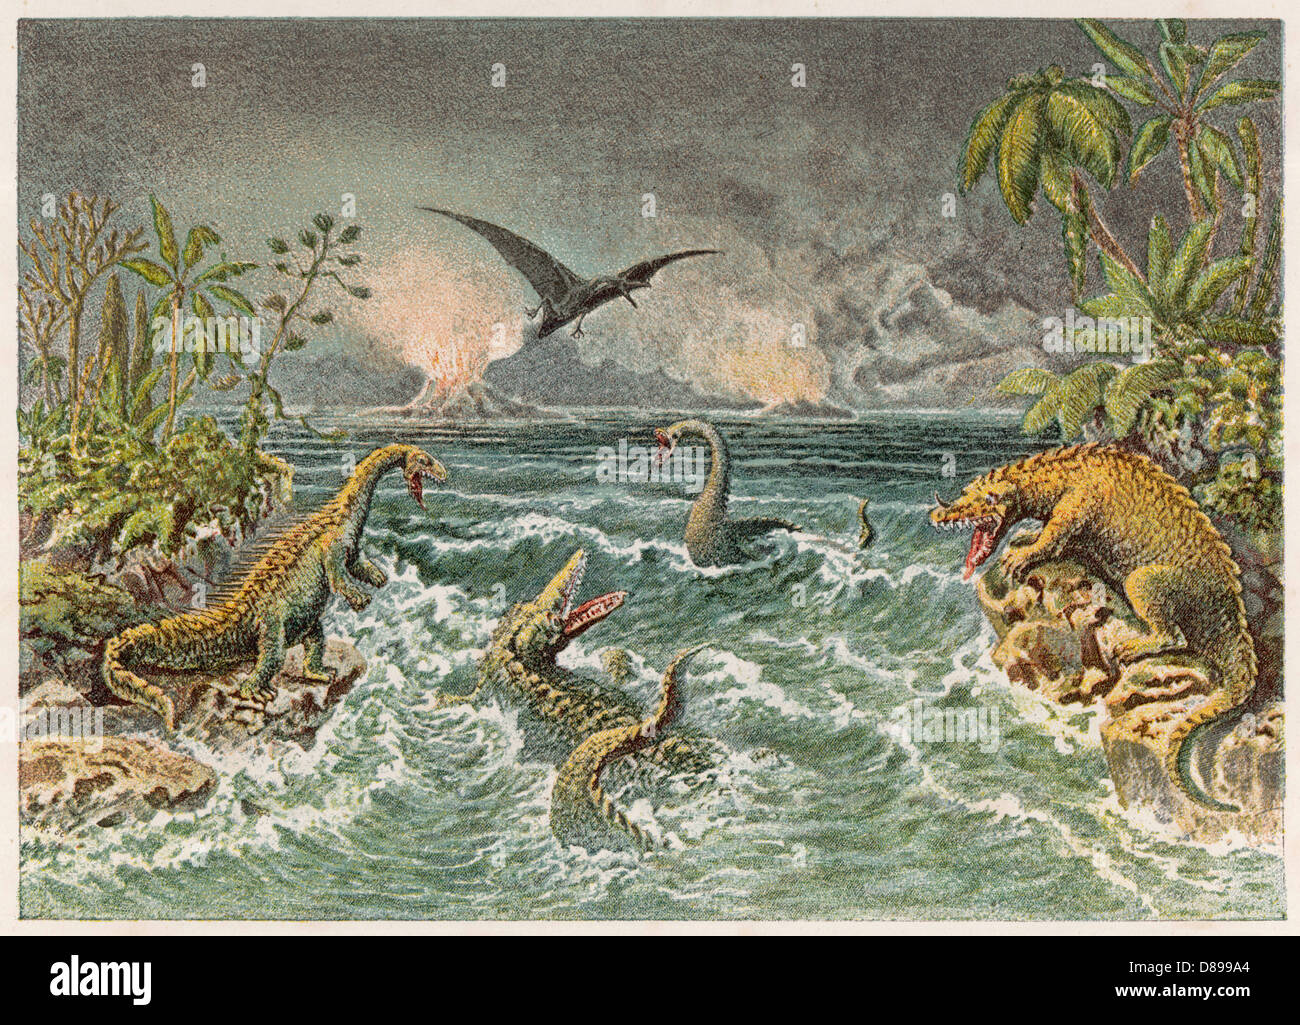 Mesozoic Lscape - Stock Image